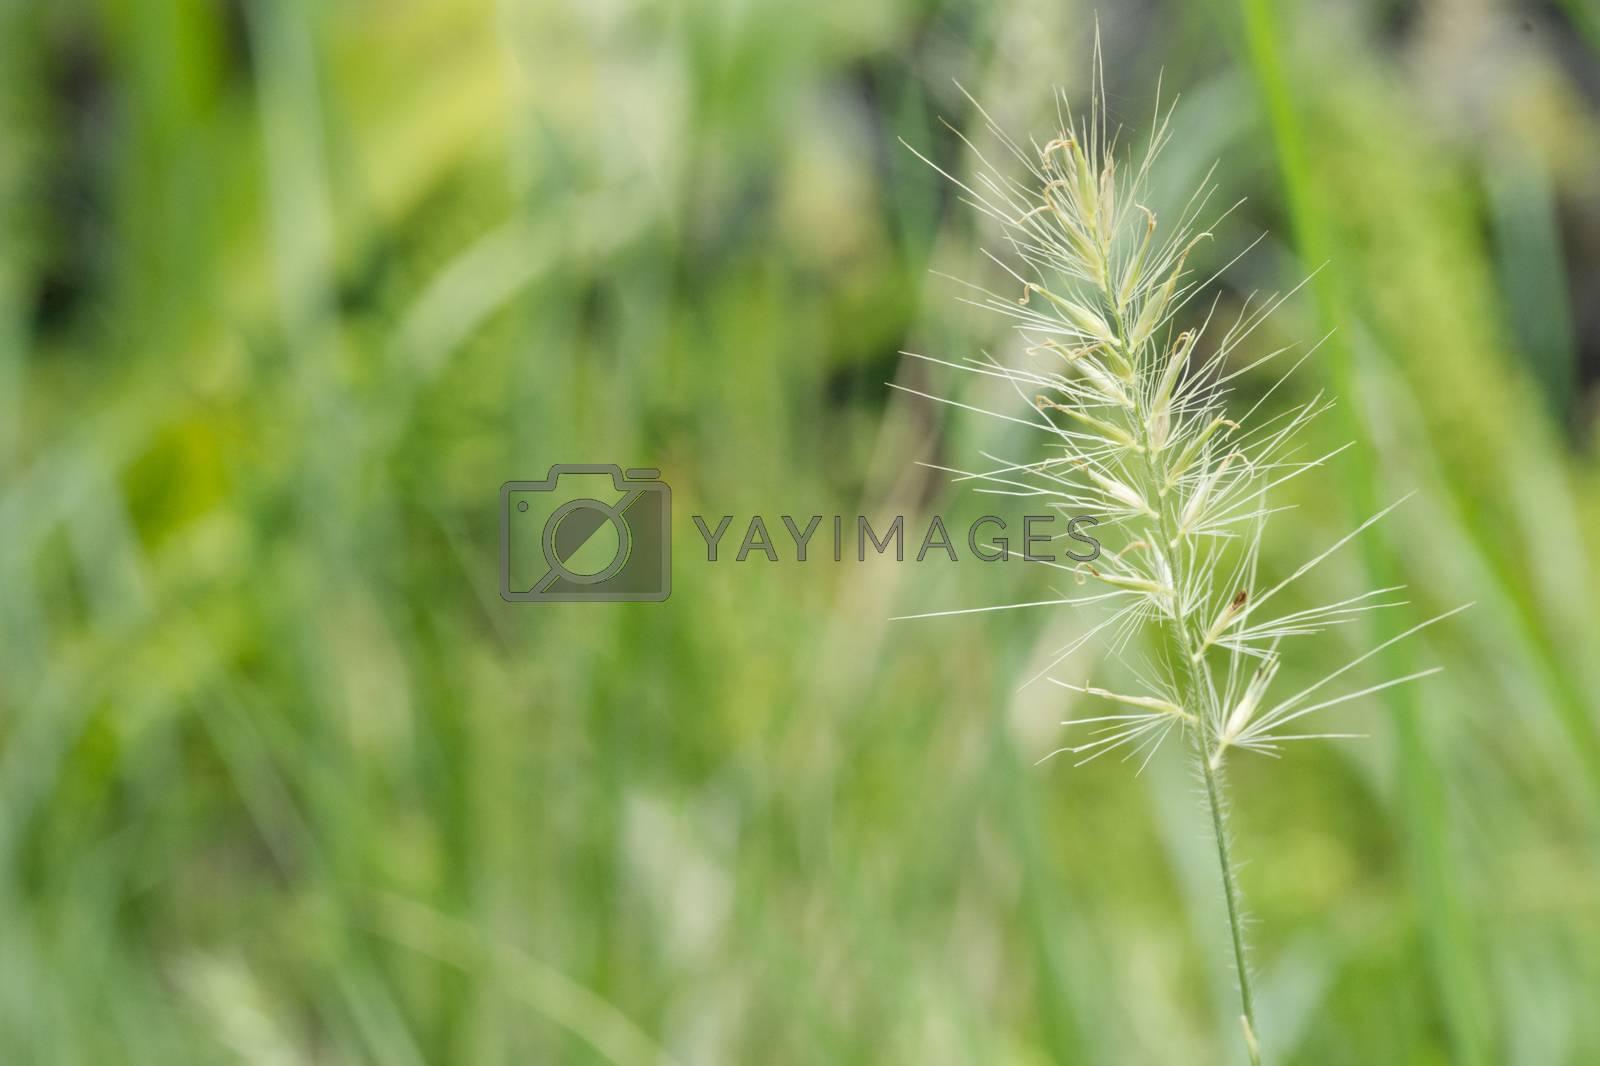 Morning glory green grass garden background image.